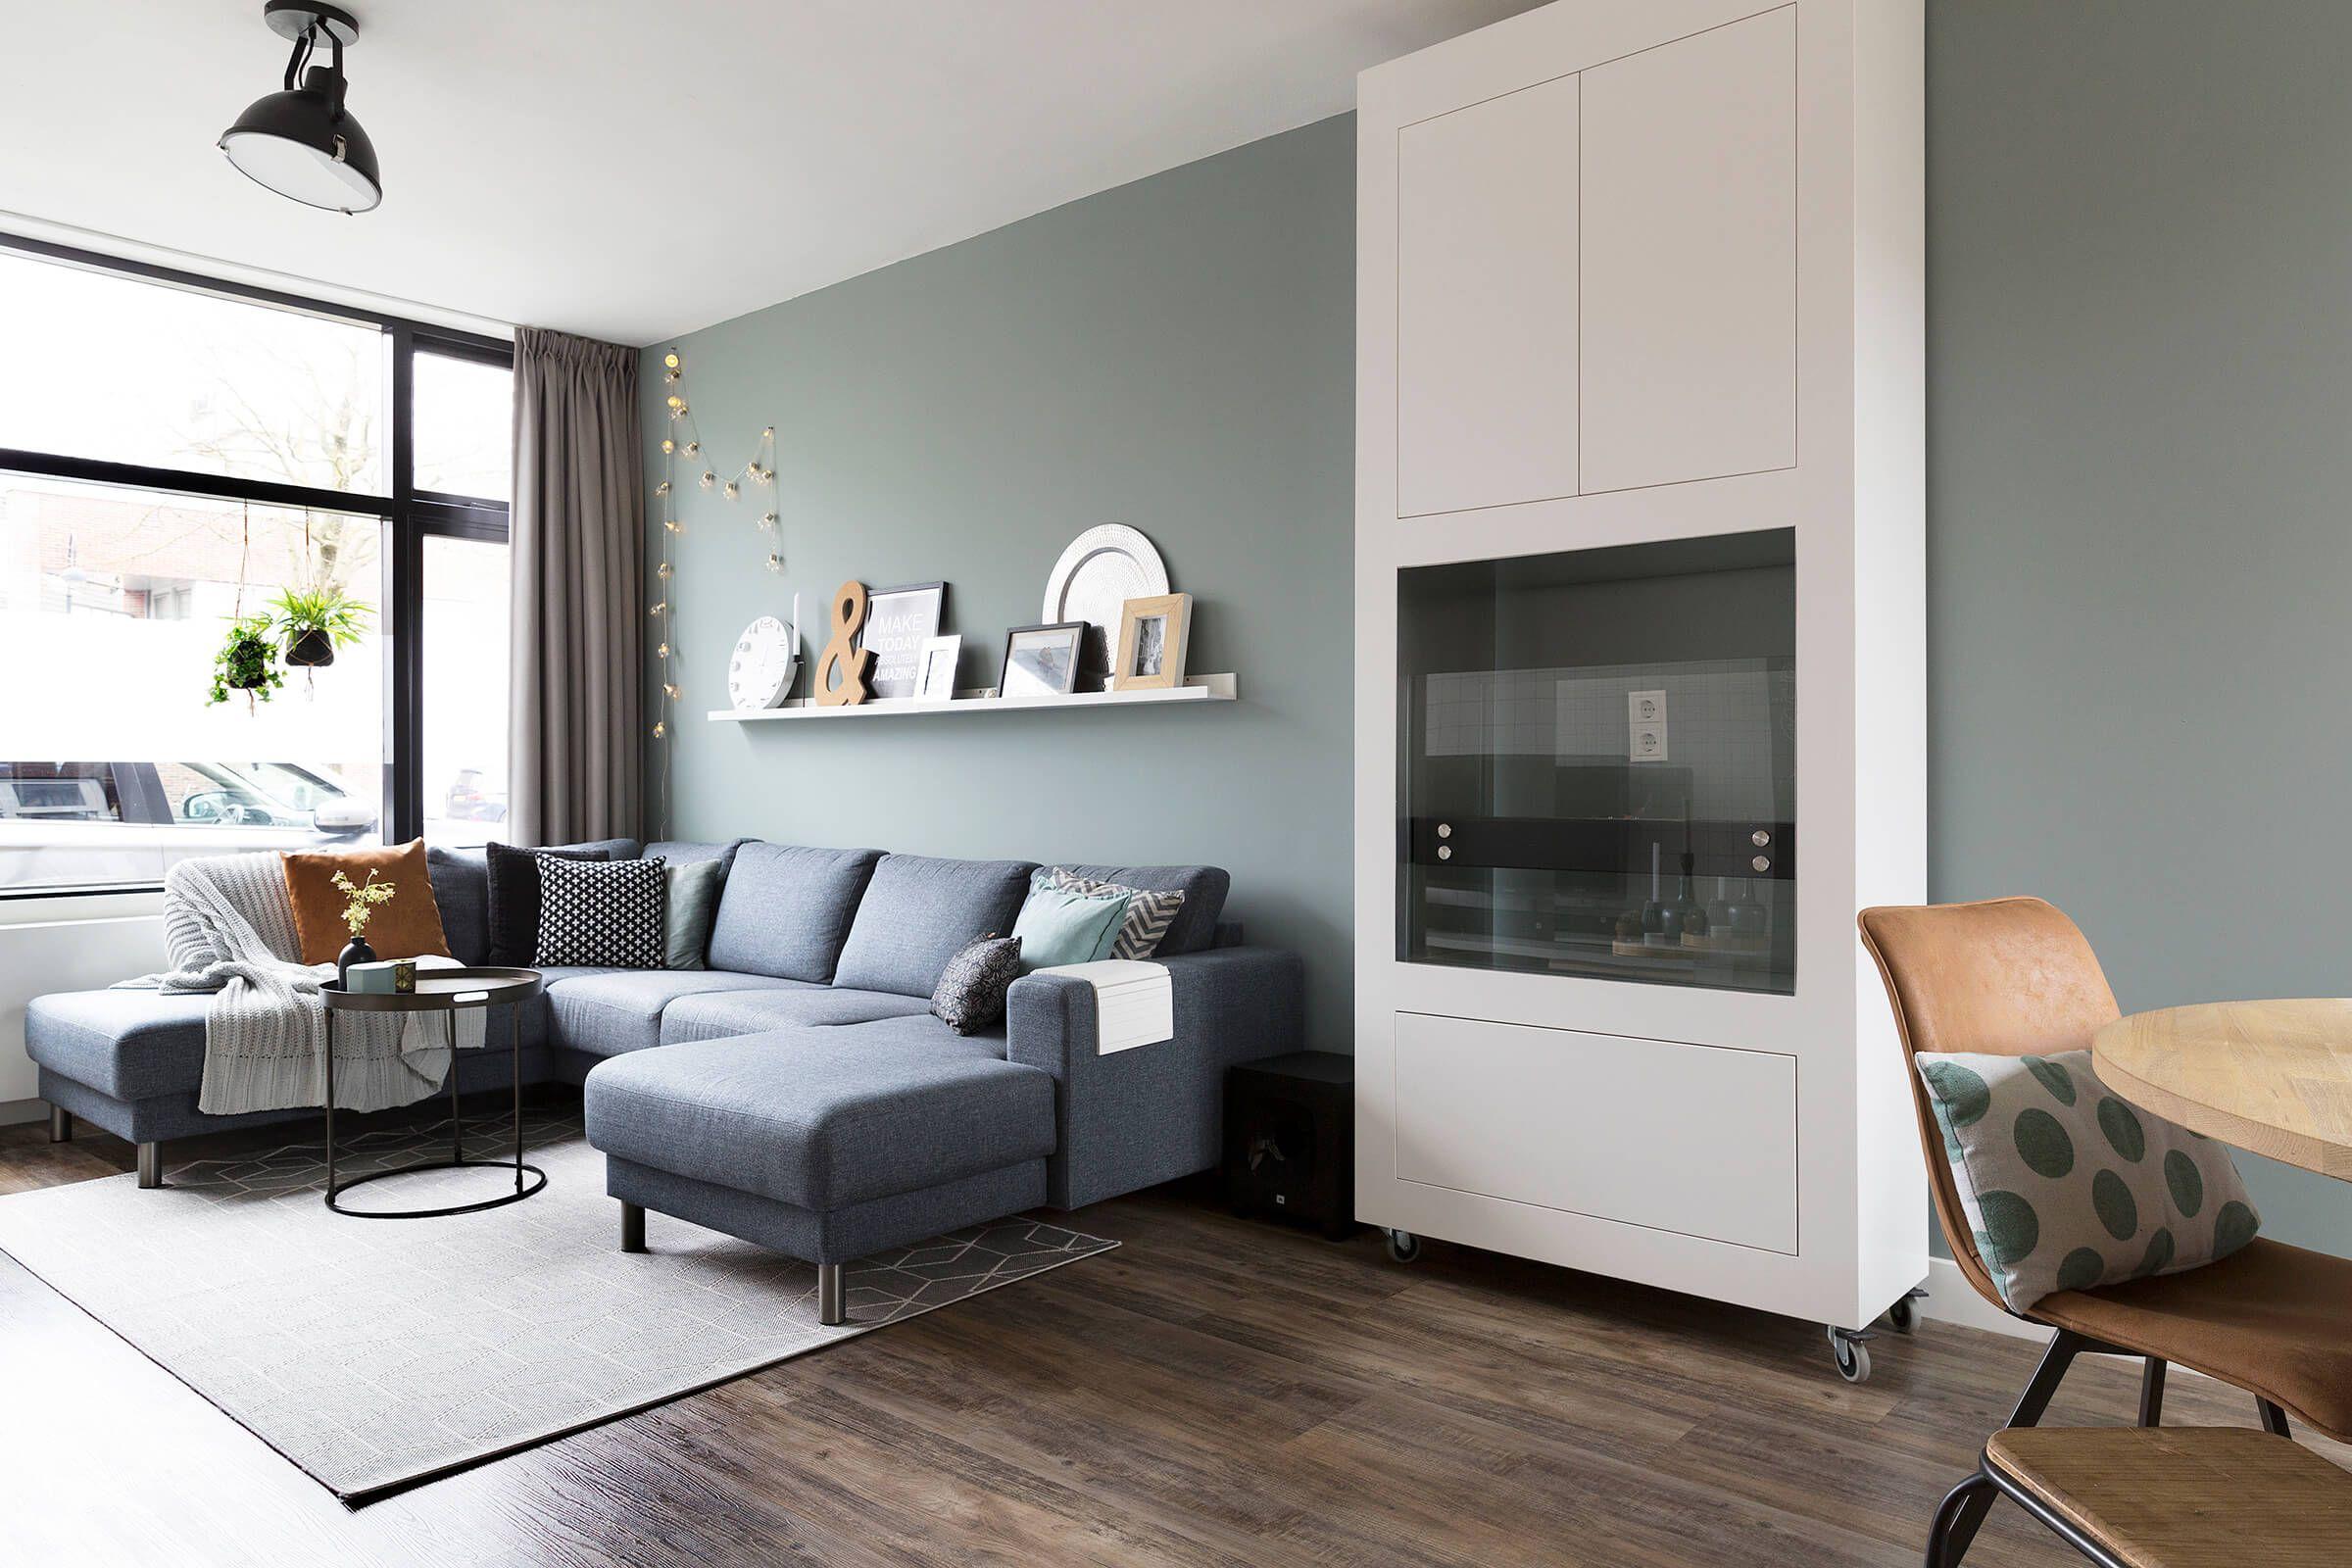 Woonkamer groene muur en donkere kozijnen | Homeful woonkamer 2 ...